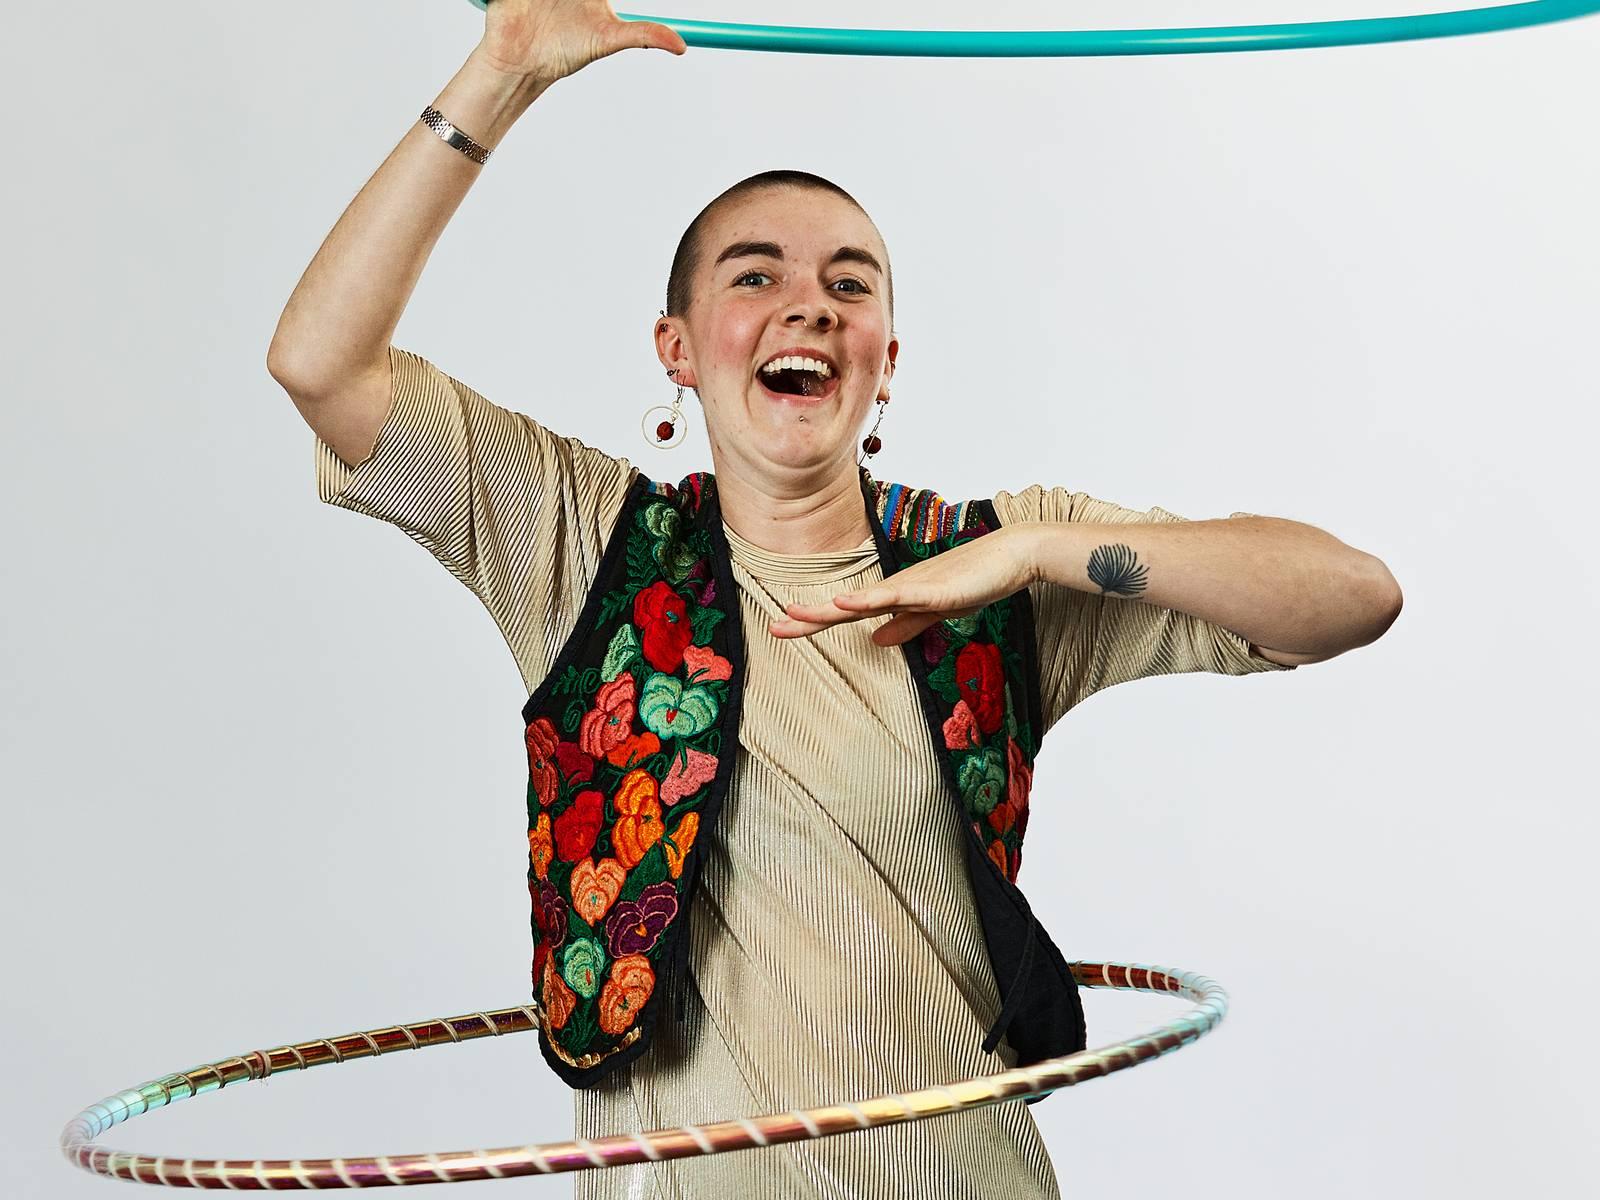 Alice hula-hooping